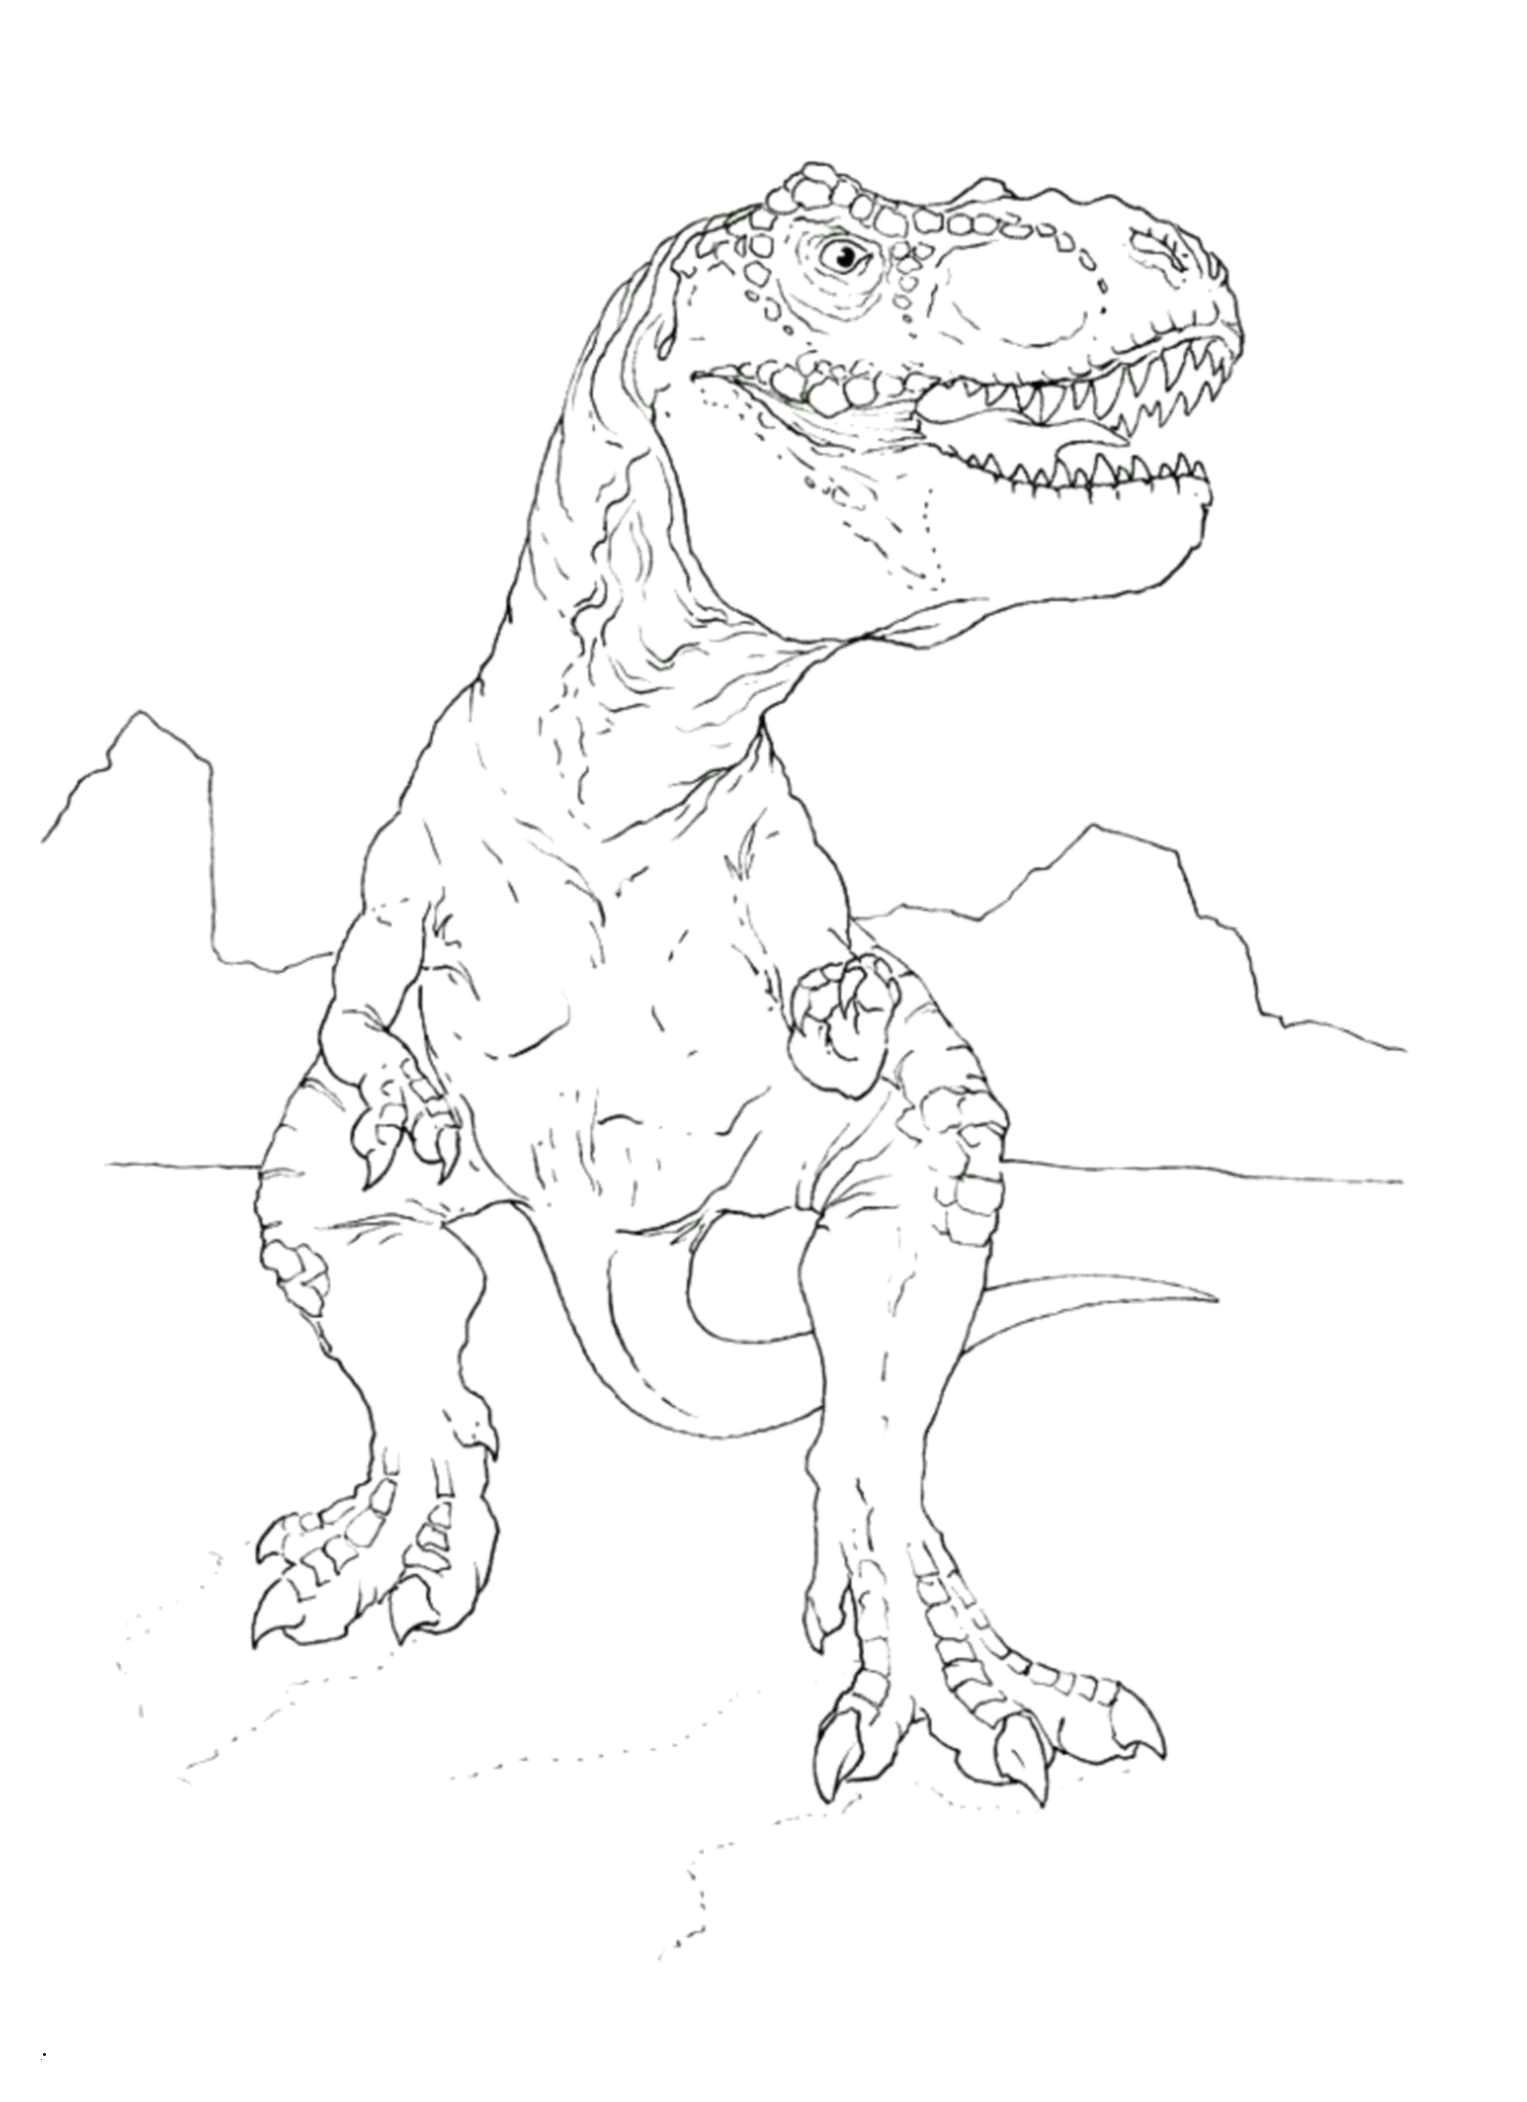 tyrannosaurus rex ausmalbild beau photographie bayern ausmalbilder schon igel grundschule 0d archives neu elegant